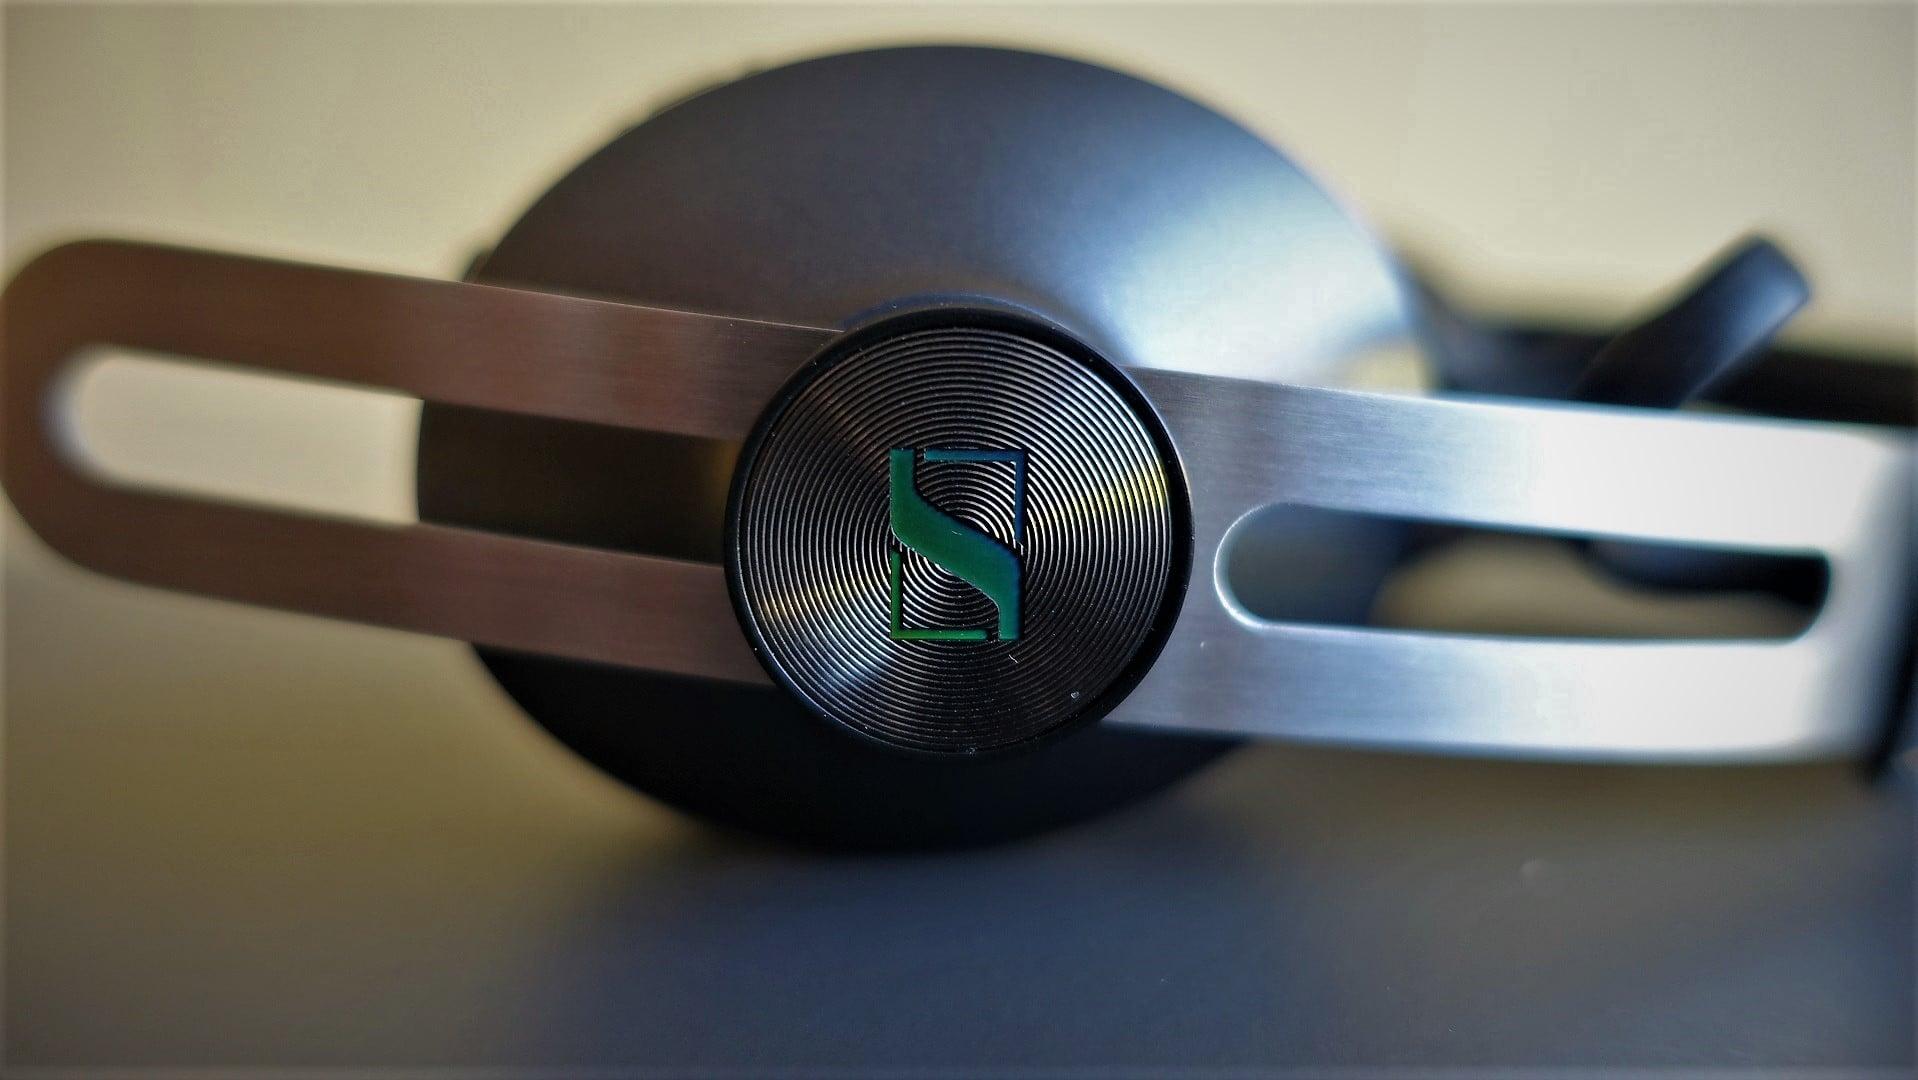 Recenzja słuchawek Sennheiser Momentum On-Ear Wireless M2 OEBT 20